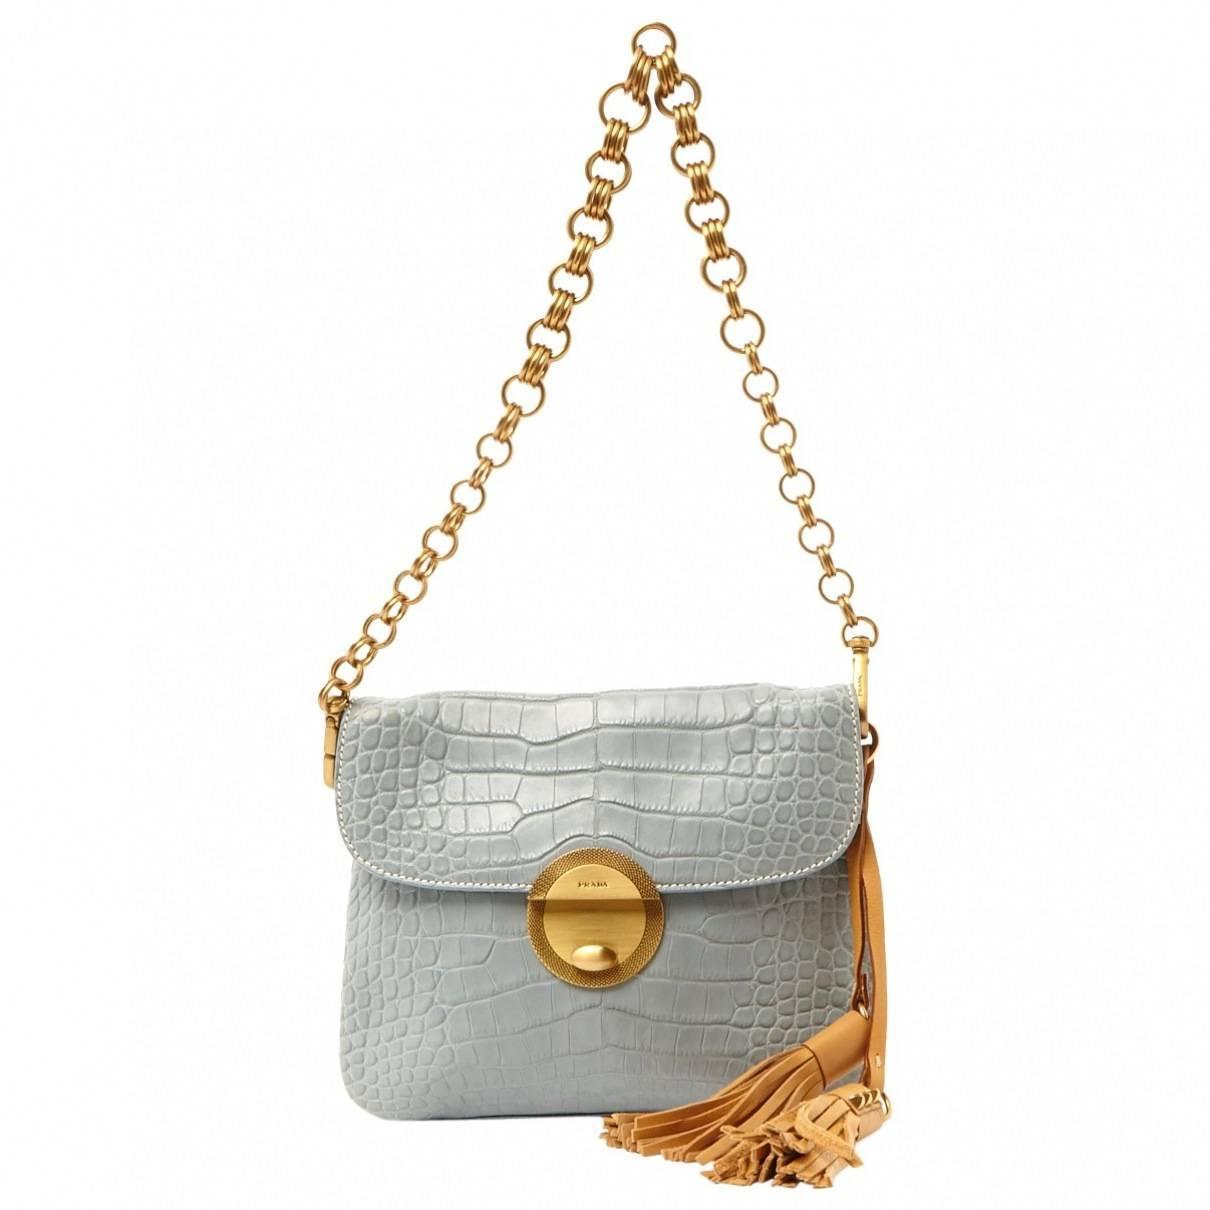 prada saffiano lux small tote bag - Pale Blue Prada Alligator Tassle Handbag Purse at 1stdibs